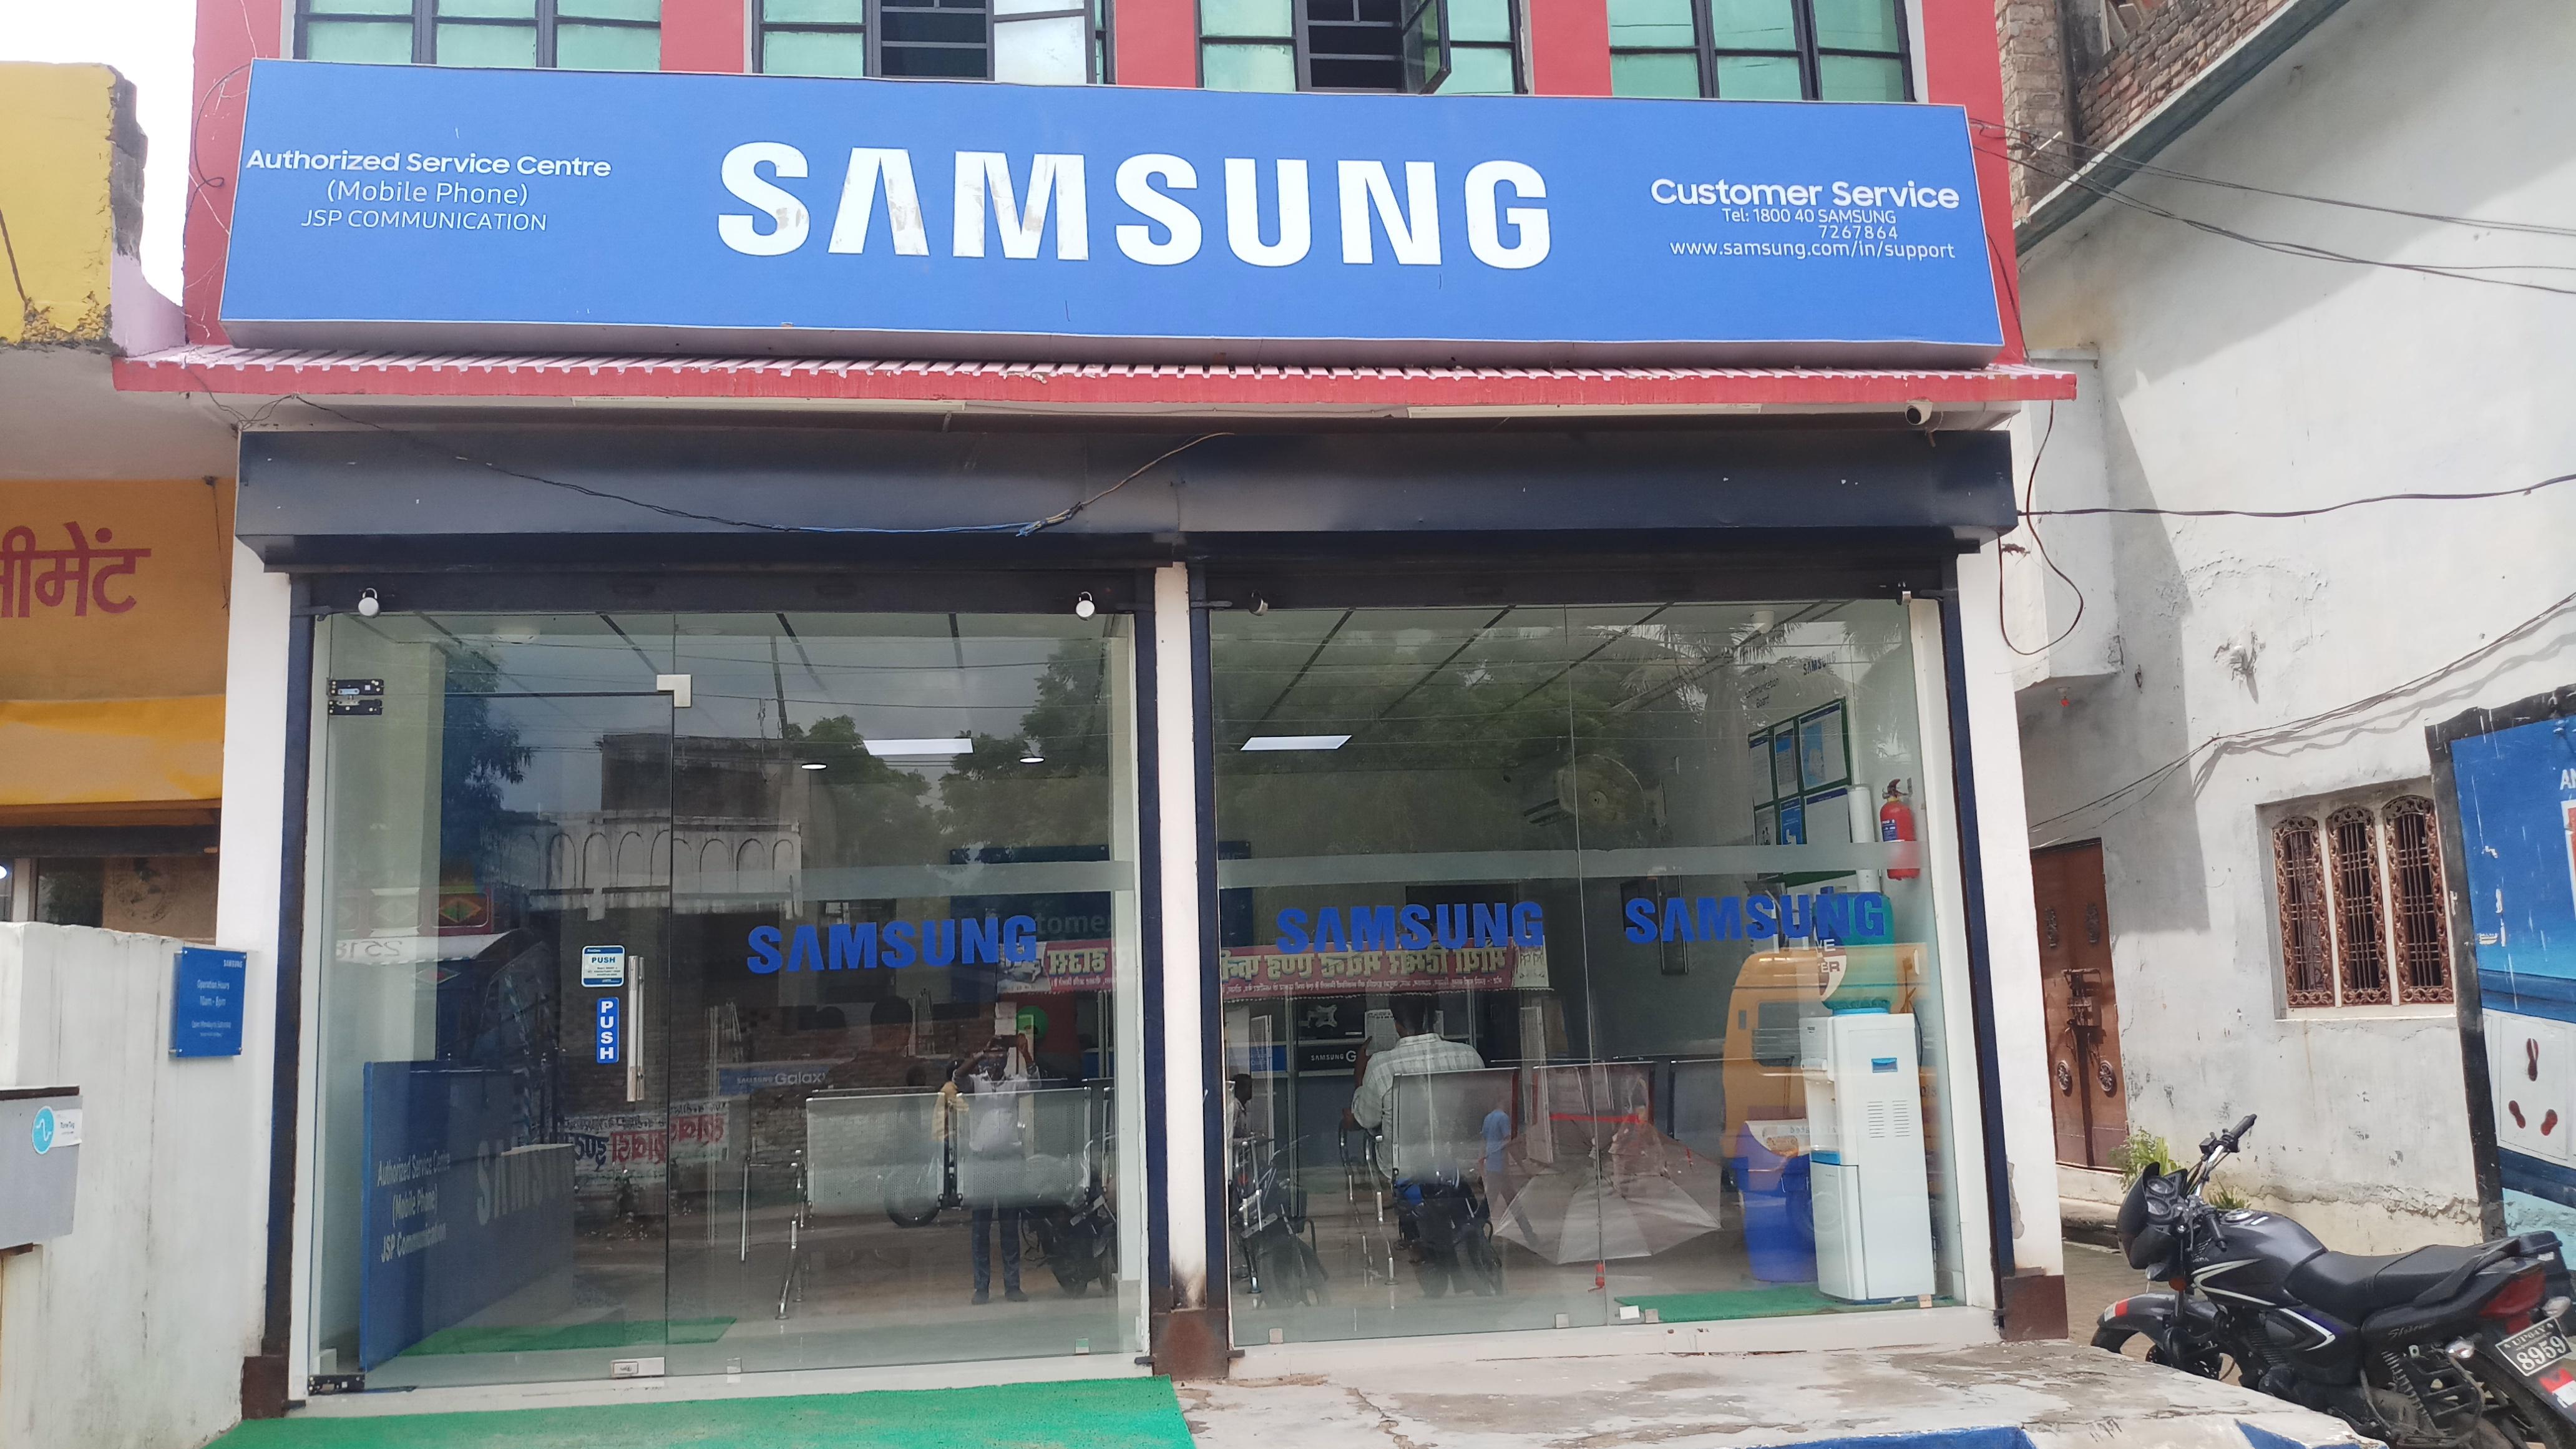 JSP Communication Samsung Service Center